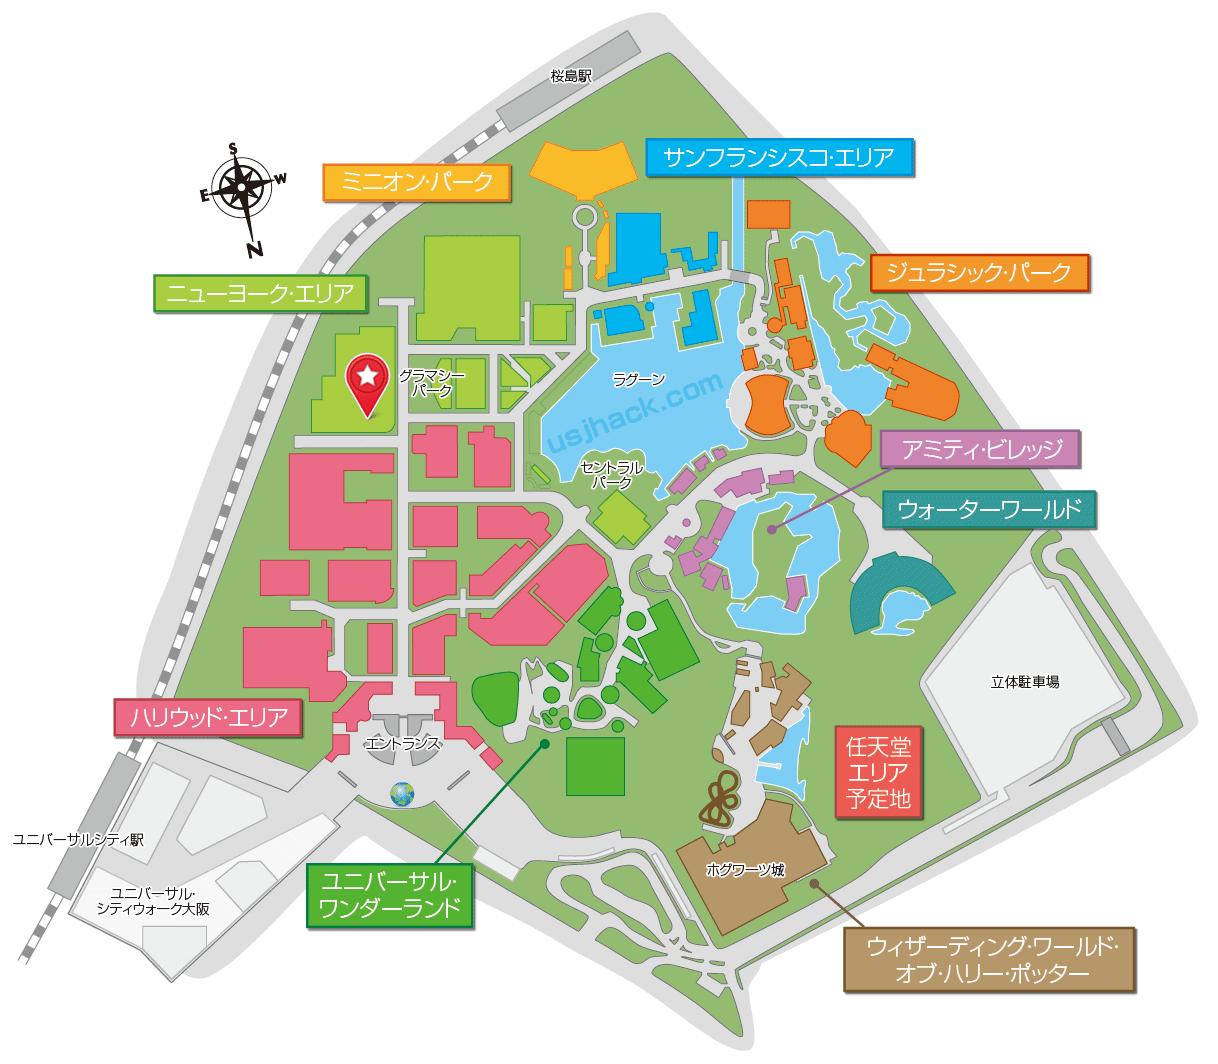 USJ貞子の開催場所マップ